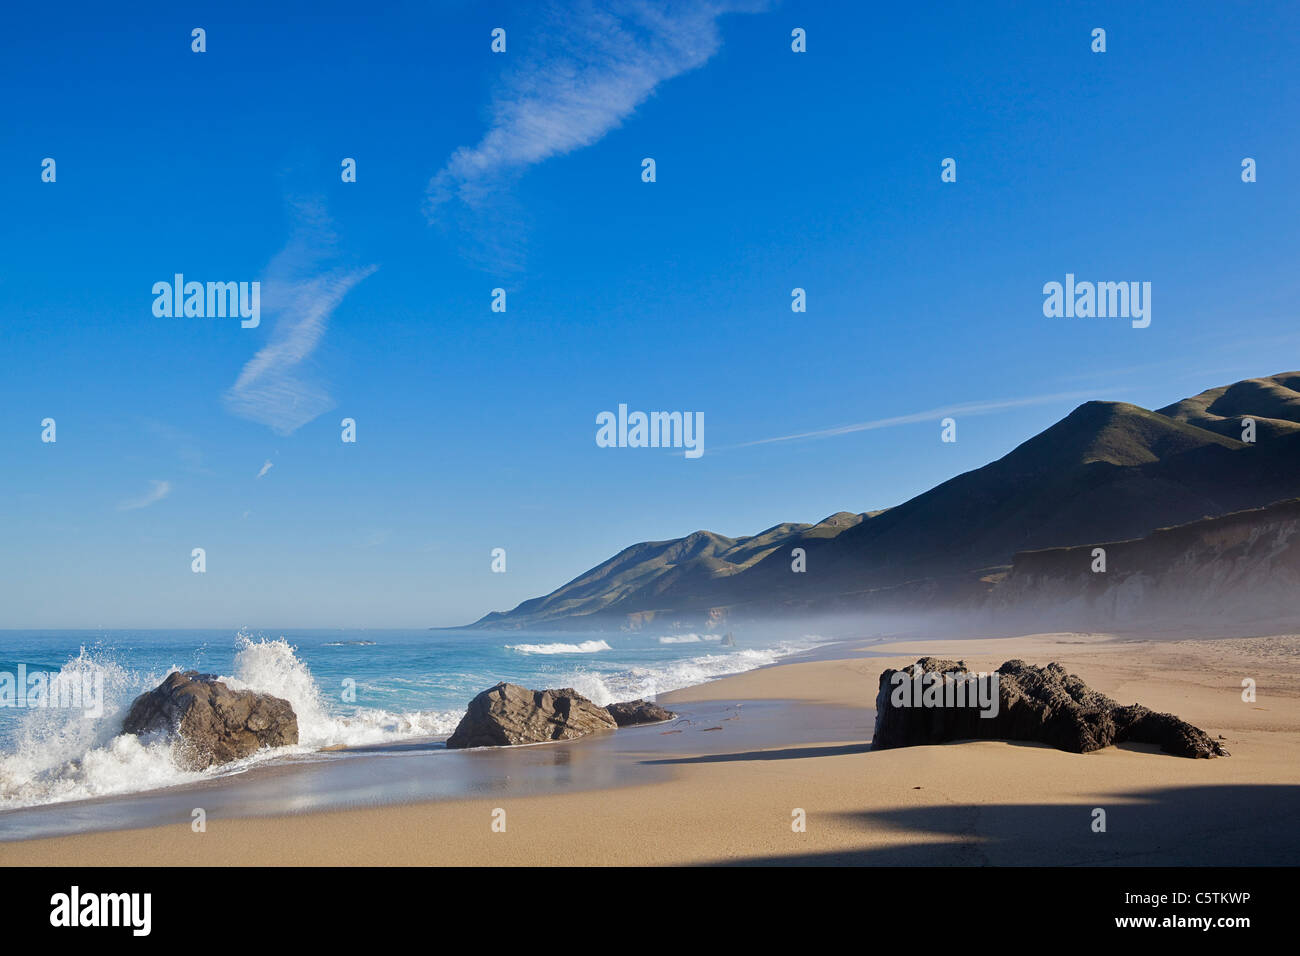 USA, California, Deserted beach Stock Photo